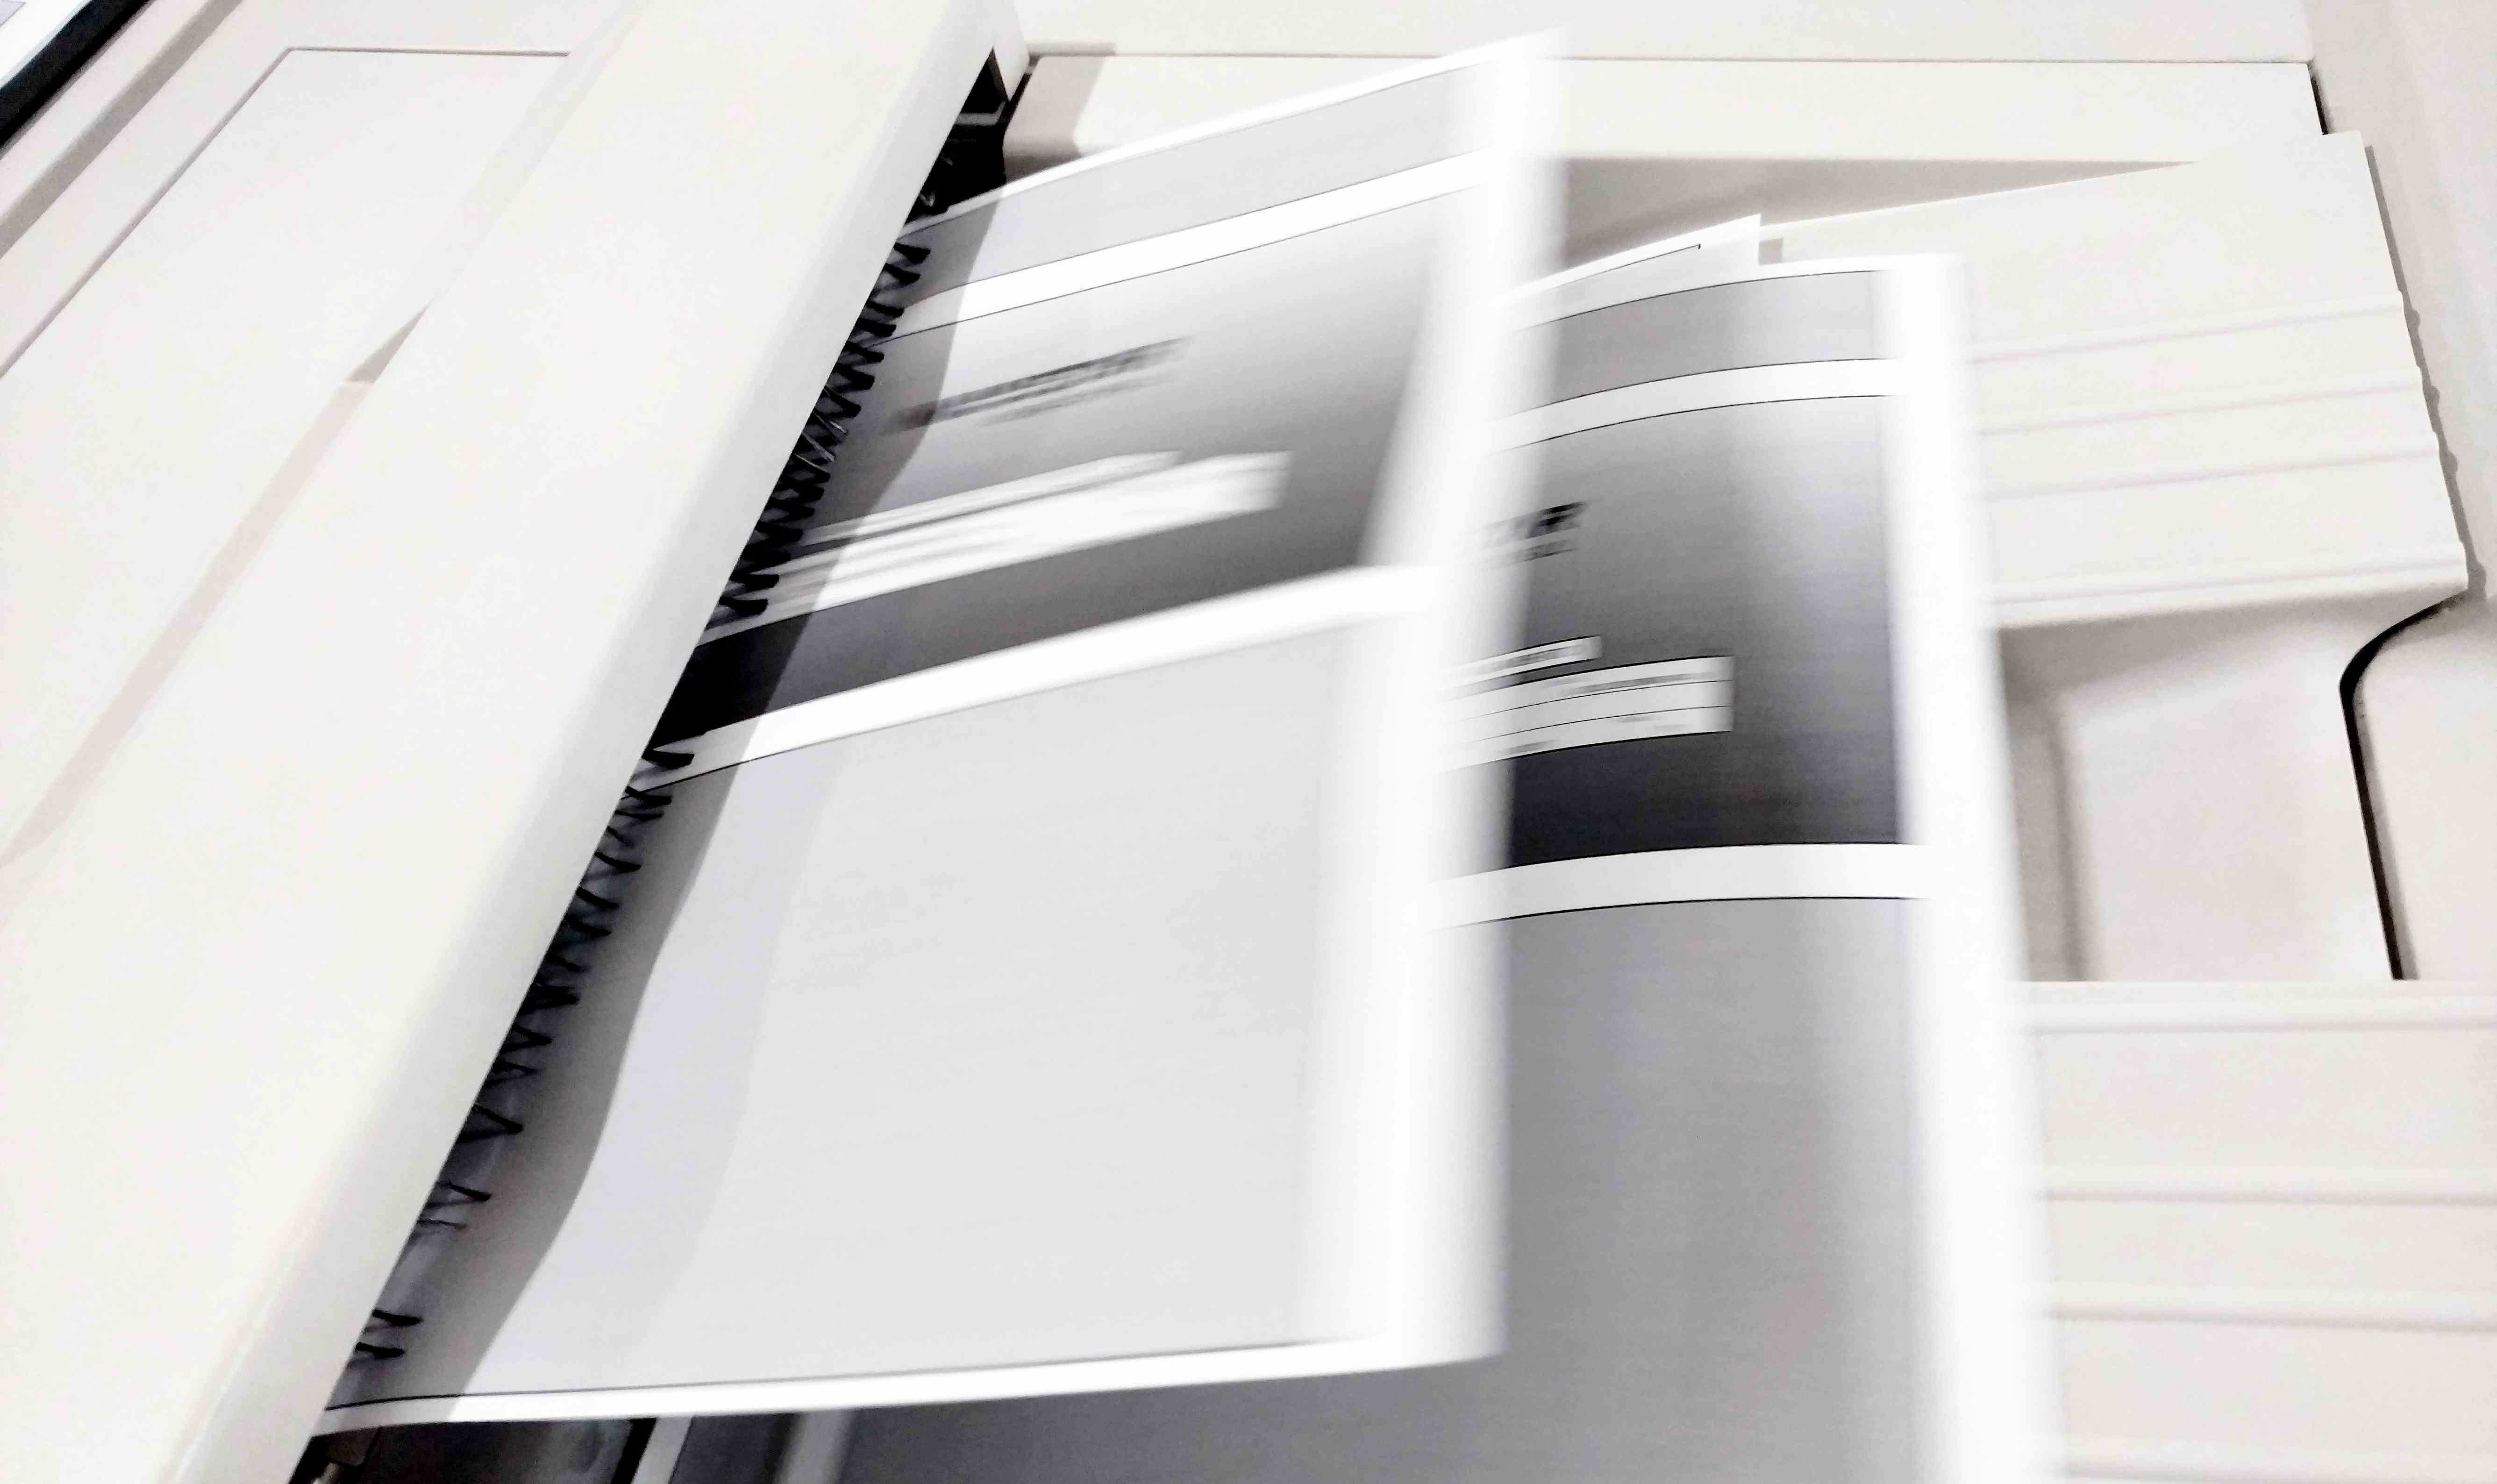 adesivo-de-vinil-printcenter-banner1